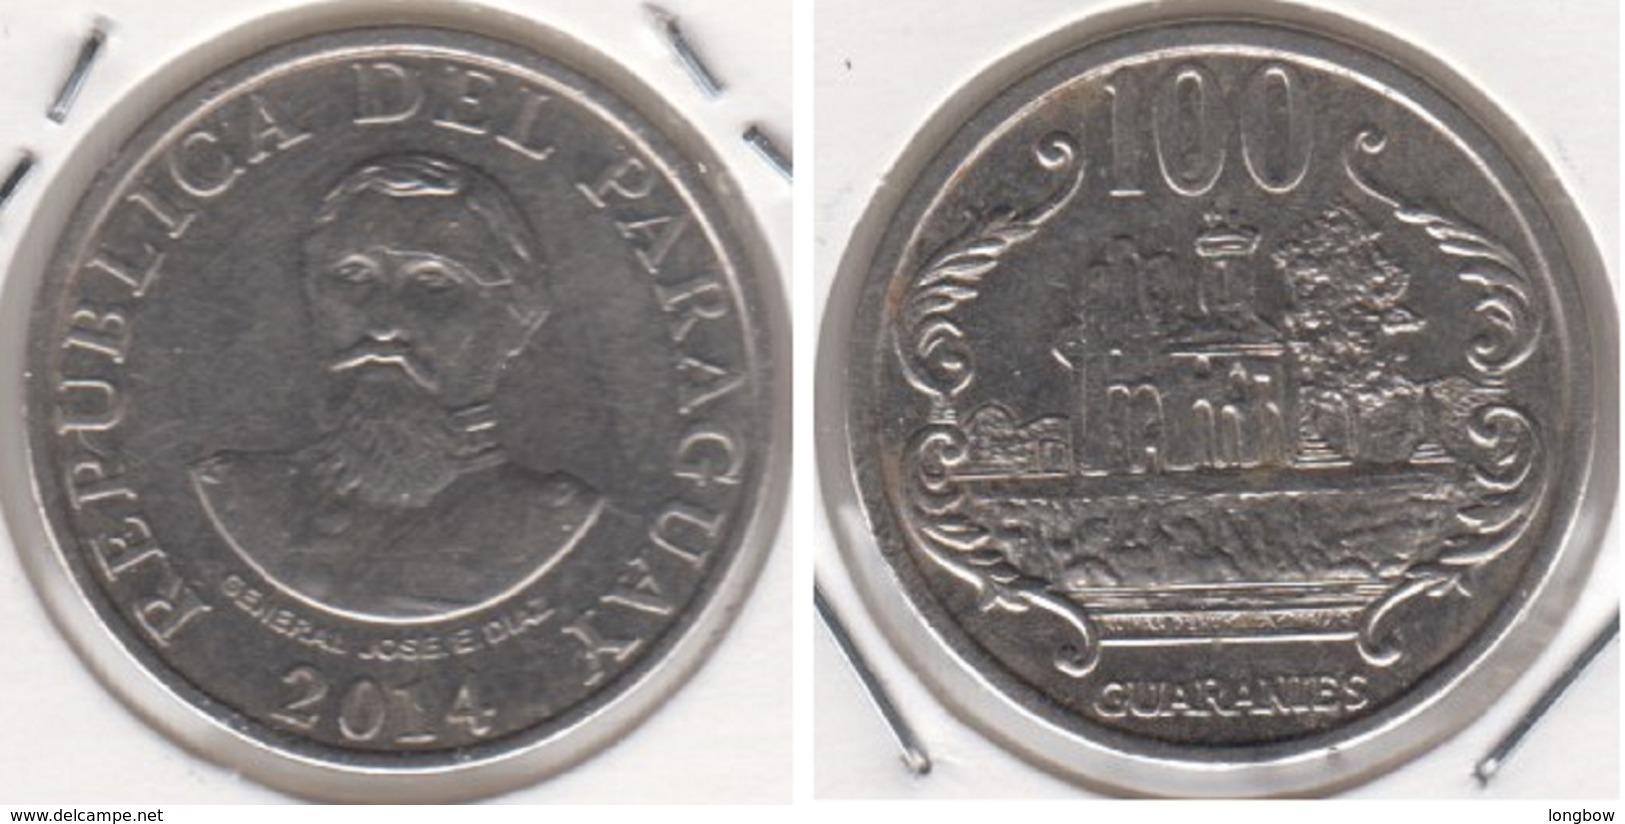 Paraguay 100 Guaranies 2014 KM#177b - Used - Paraguay